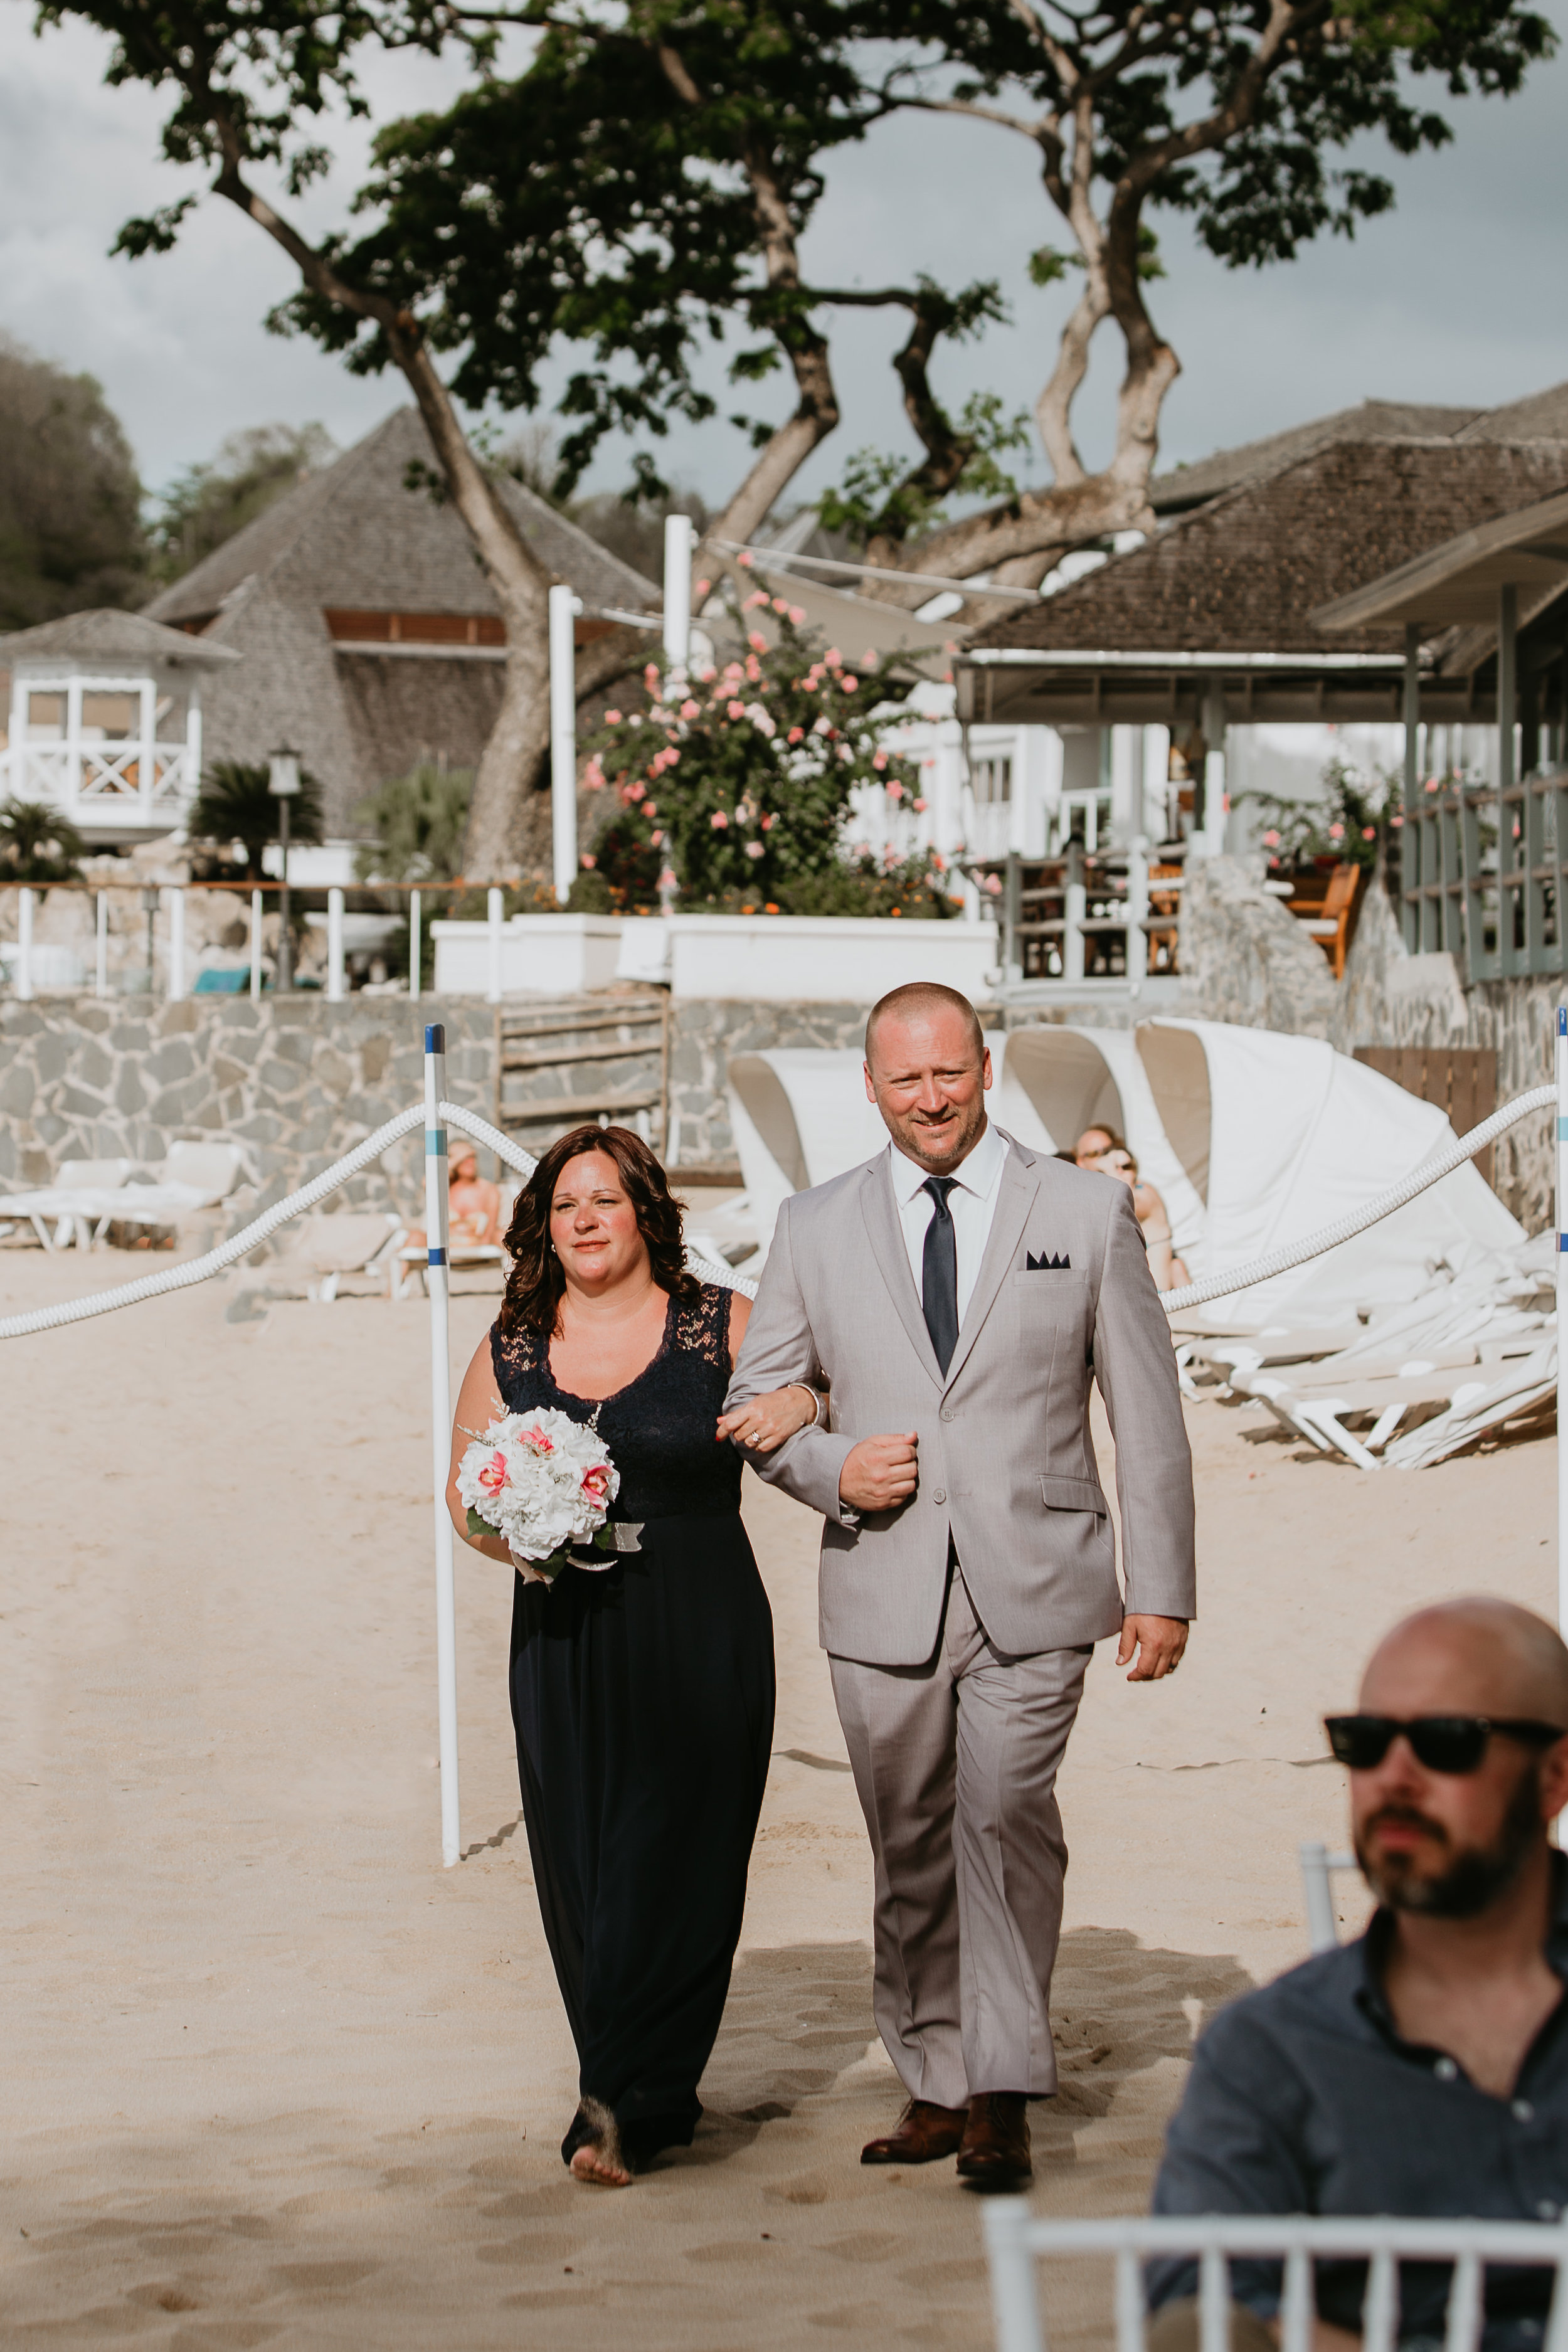 nicole-daacke-photography-destination-wedding-in-st-lucia-sandals-la-toc-intimate-island-wedding-carribean-elopement-photographer-chill-island-wedding-56.jpg